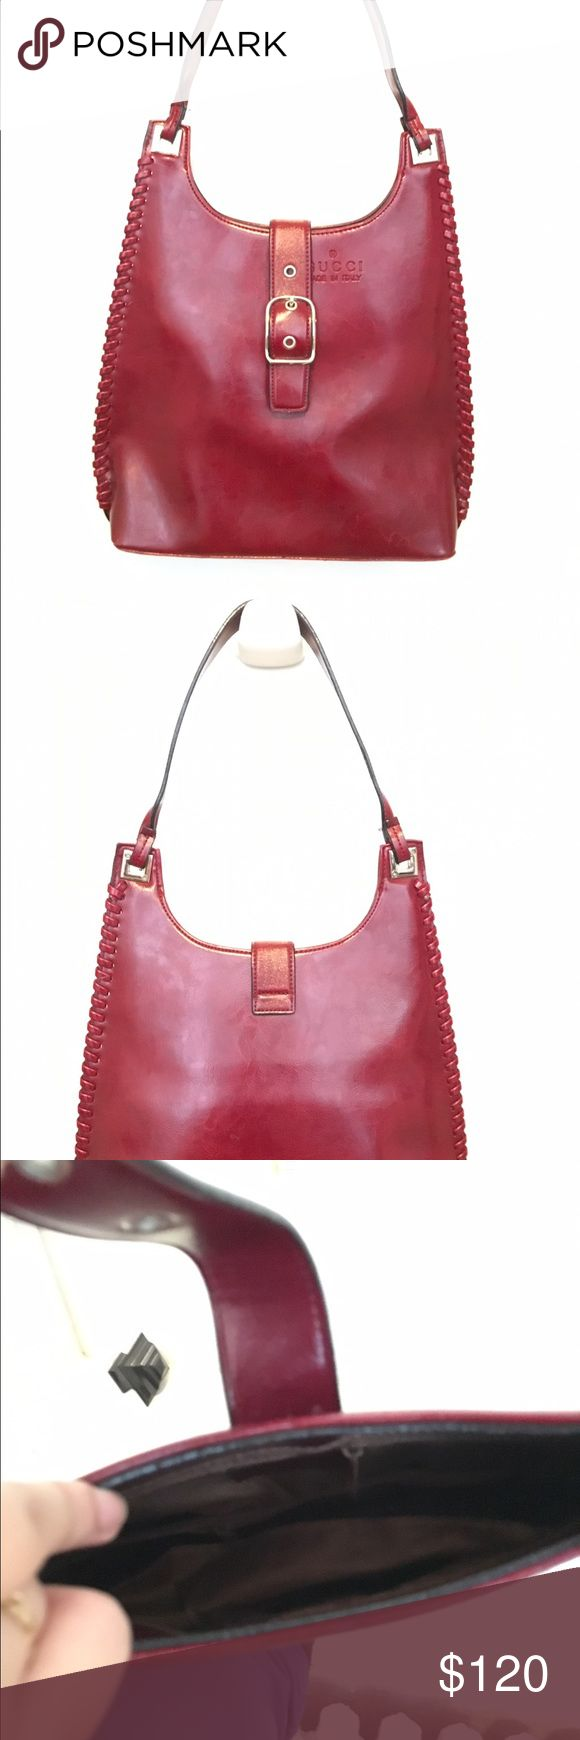 Vintage Gucci purse Dark red/ maroon, vintage Gucci shoulder purse Gucci Bags Shoulder Bags